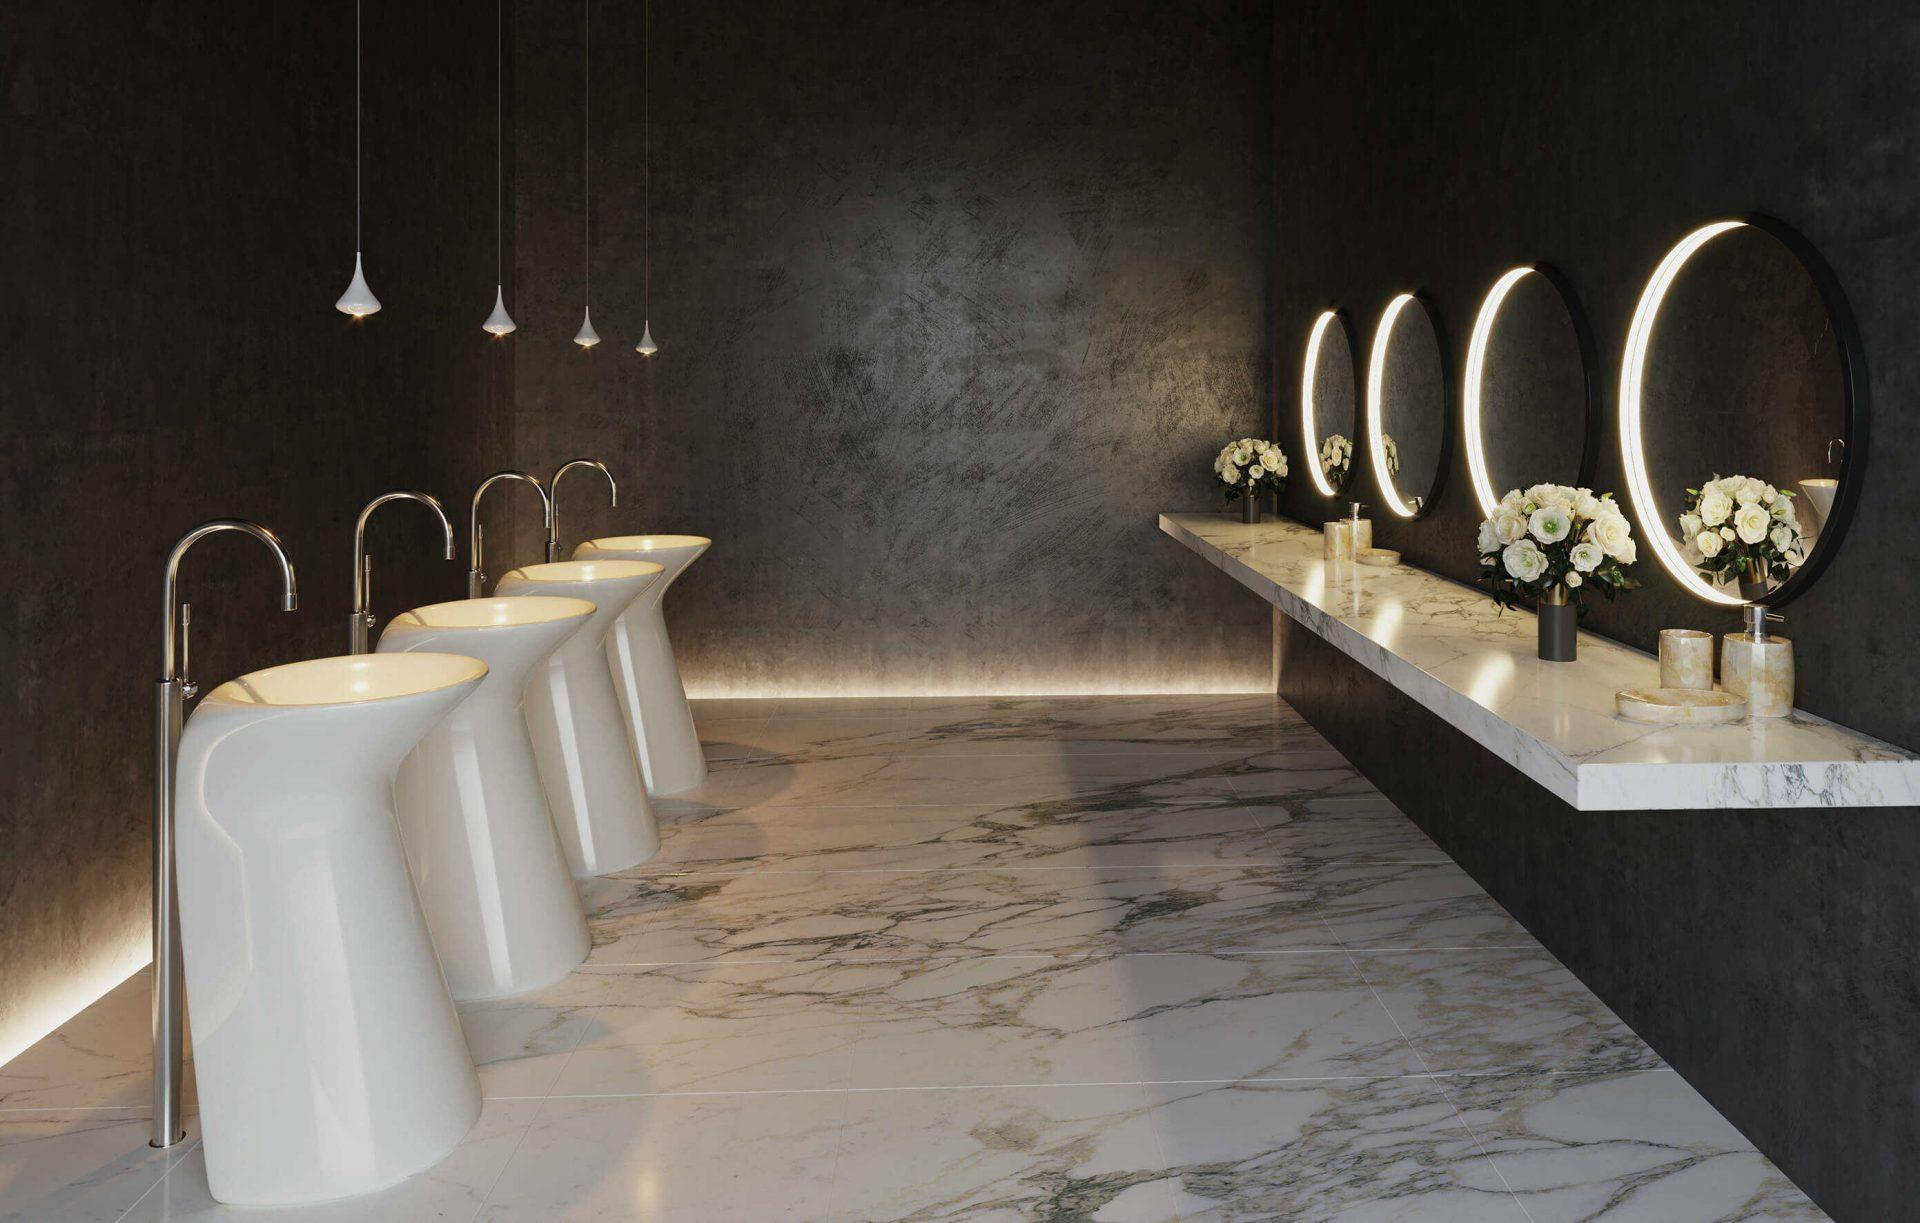 Futon speilarmaturer fra Intra Lighting i toalett